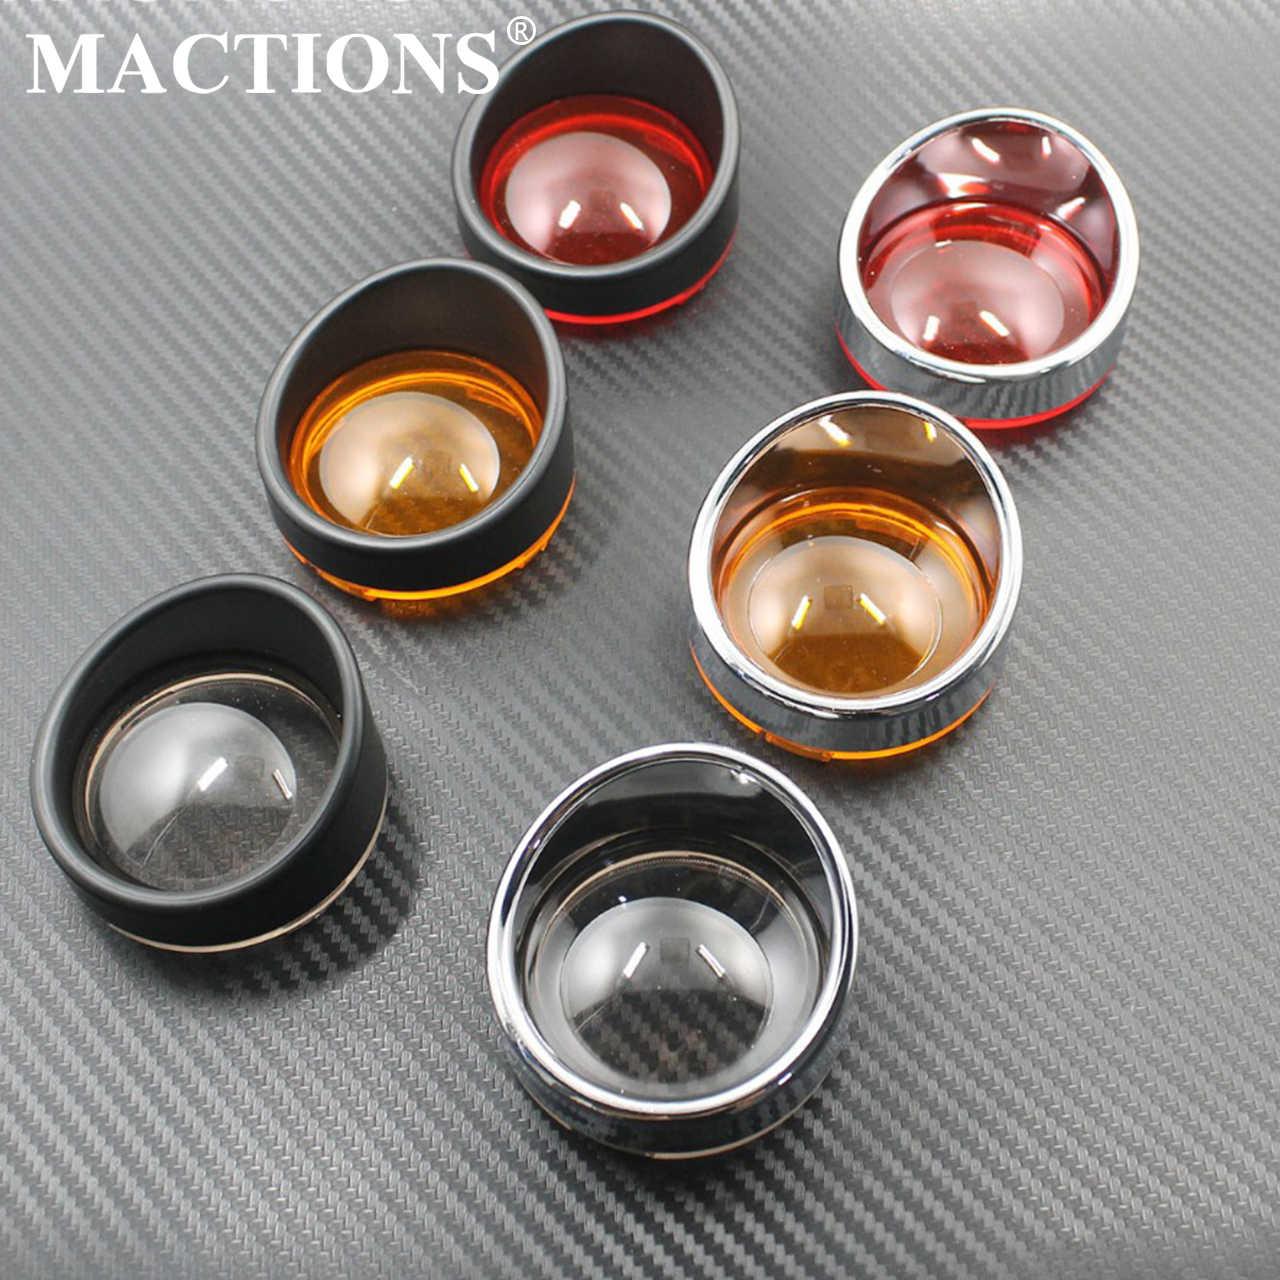 Mactions Vizier-Stijl Richtingaanwijzer Blinker Bezels Indicator Trim Ring W/Lens Voor Harley Touring FLHX Sportster softail Dyna